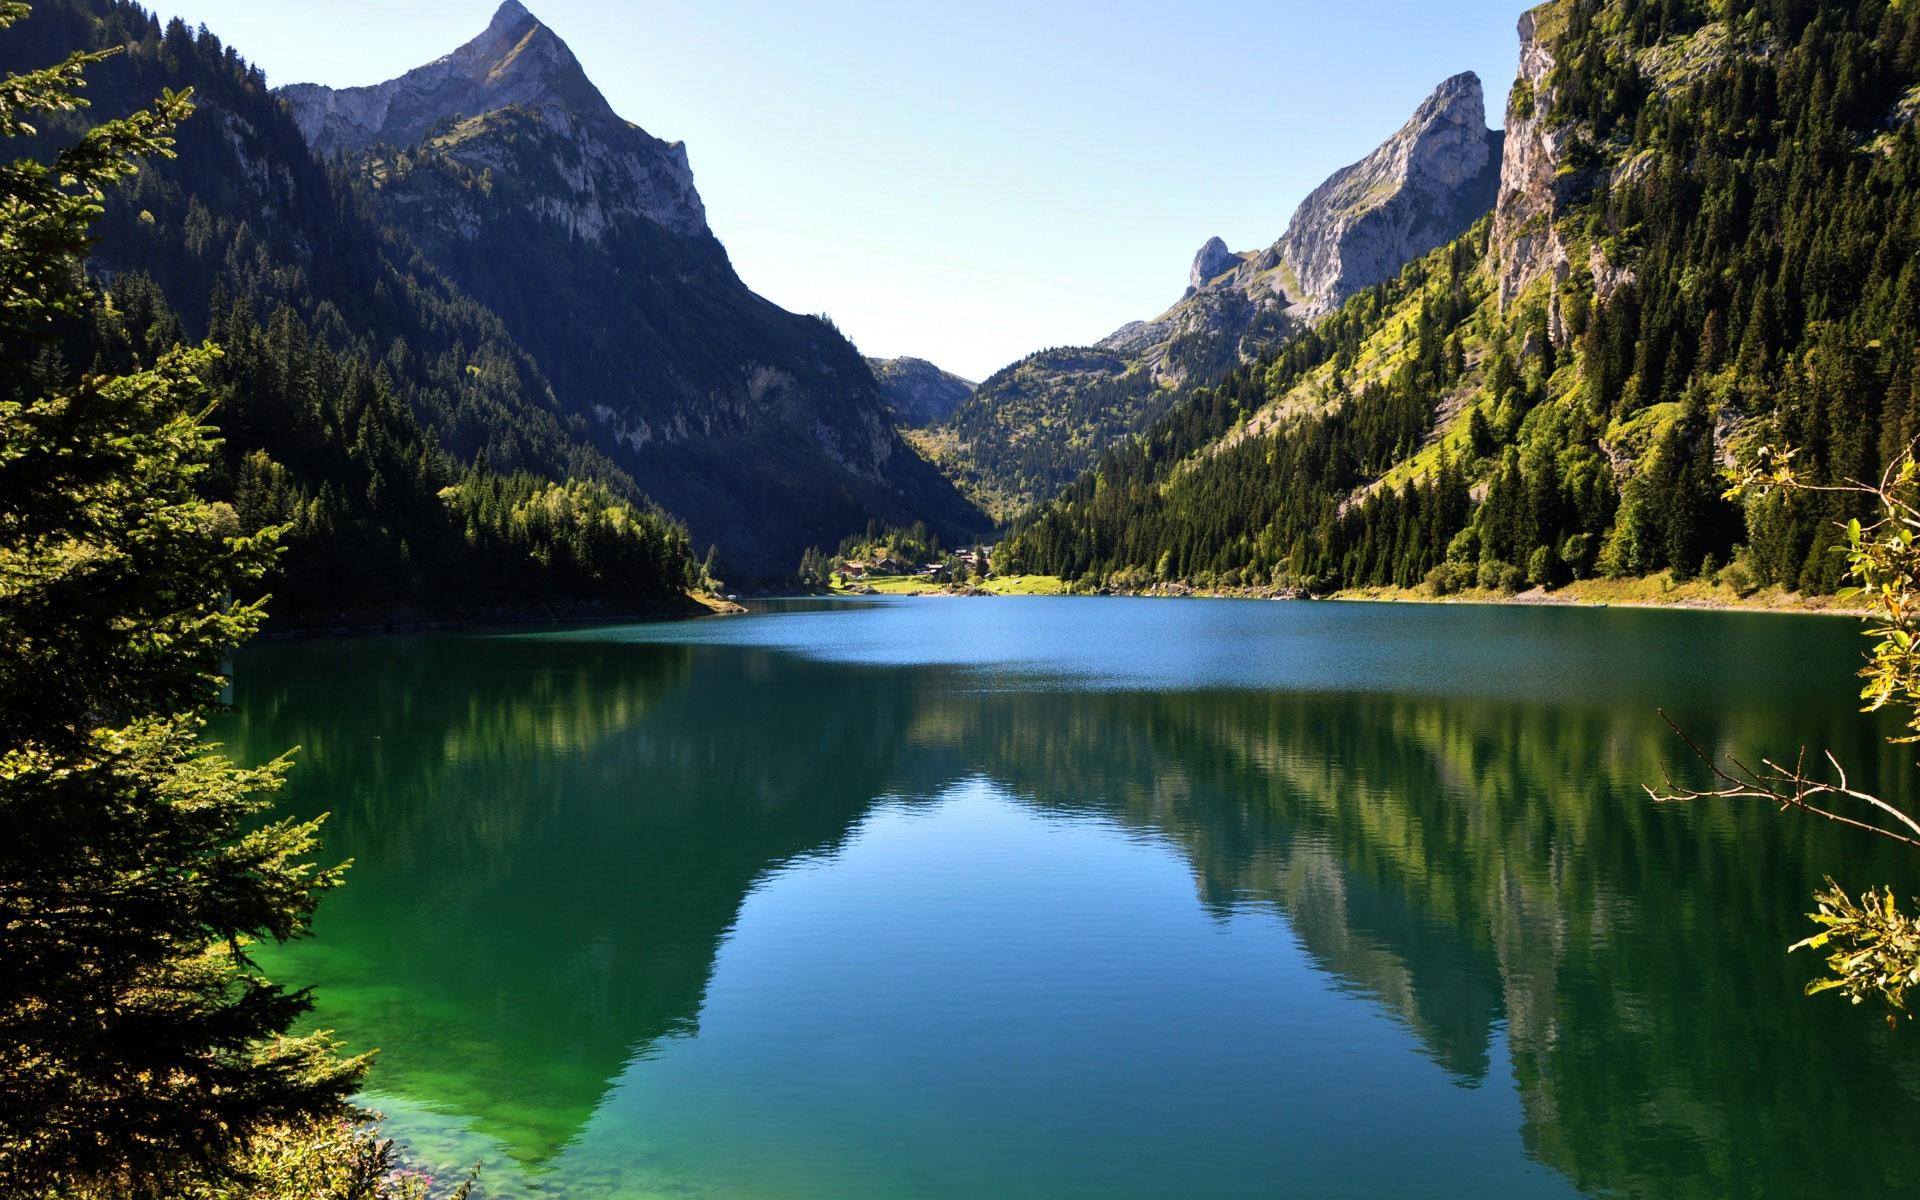 Лес горы и река картинки и обои (1)